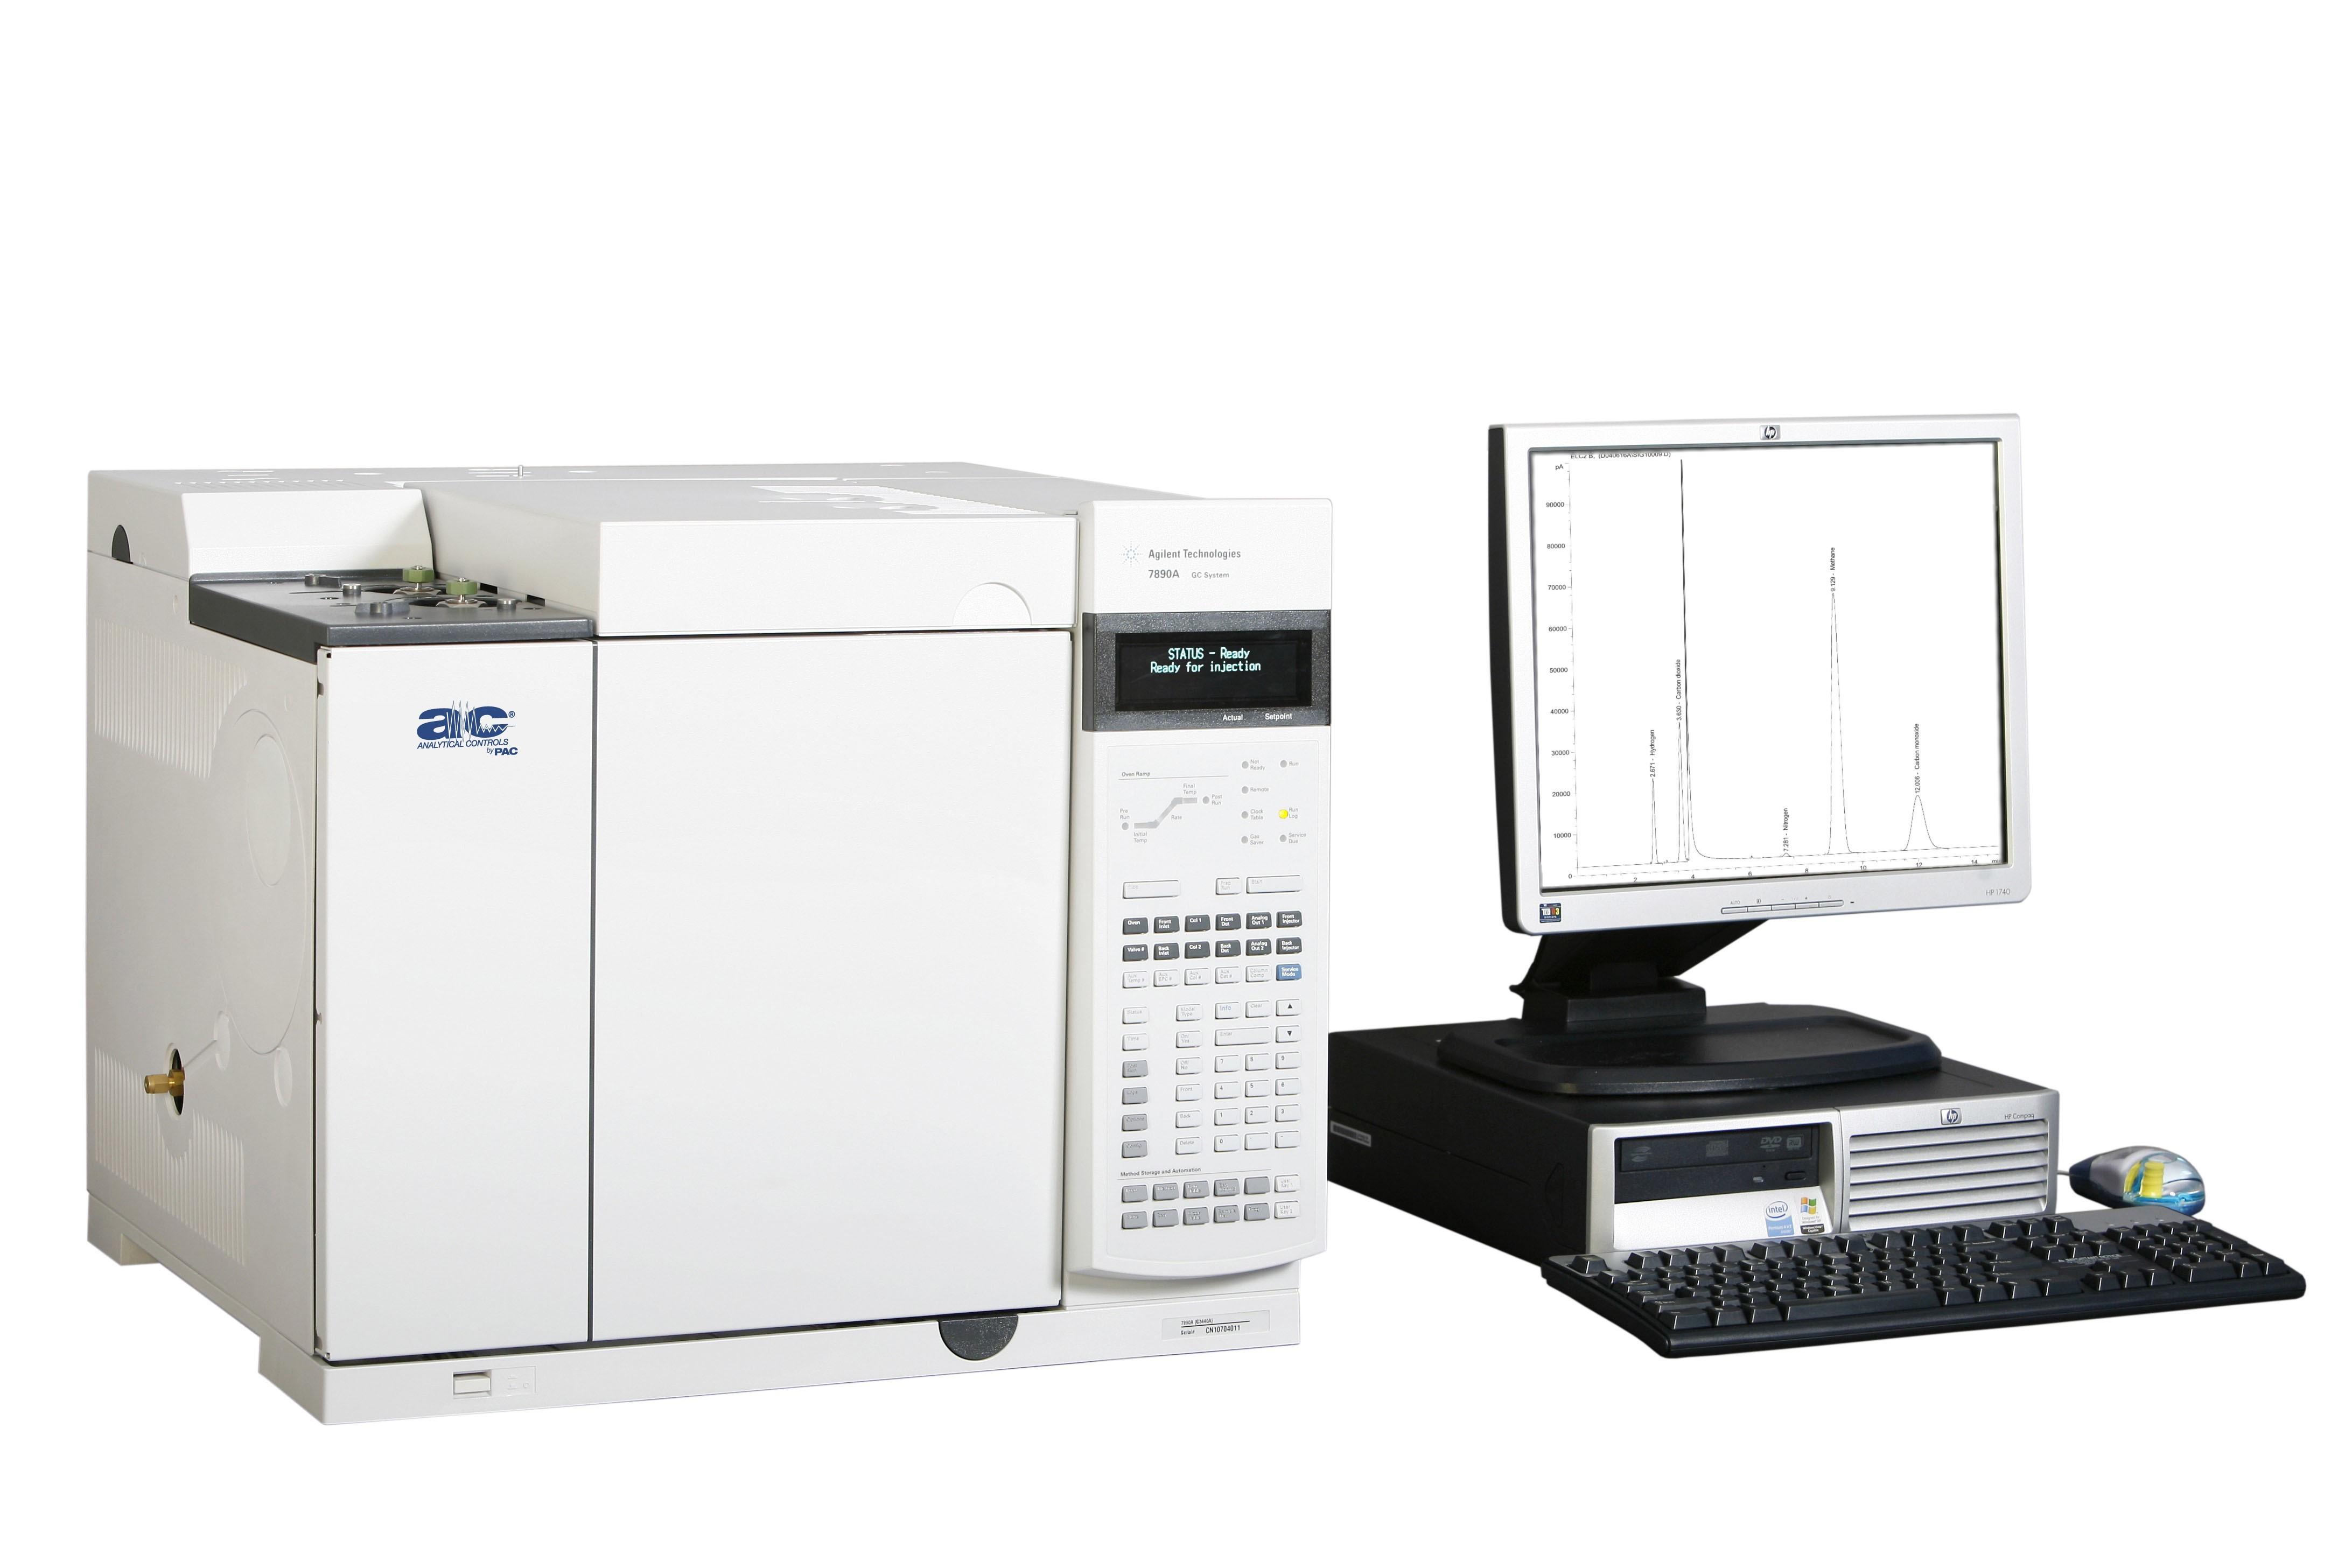 LPG/ Propylene - Components analysis